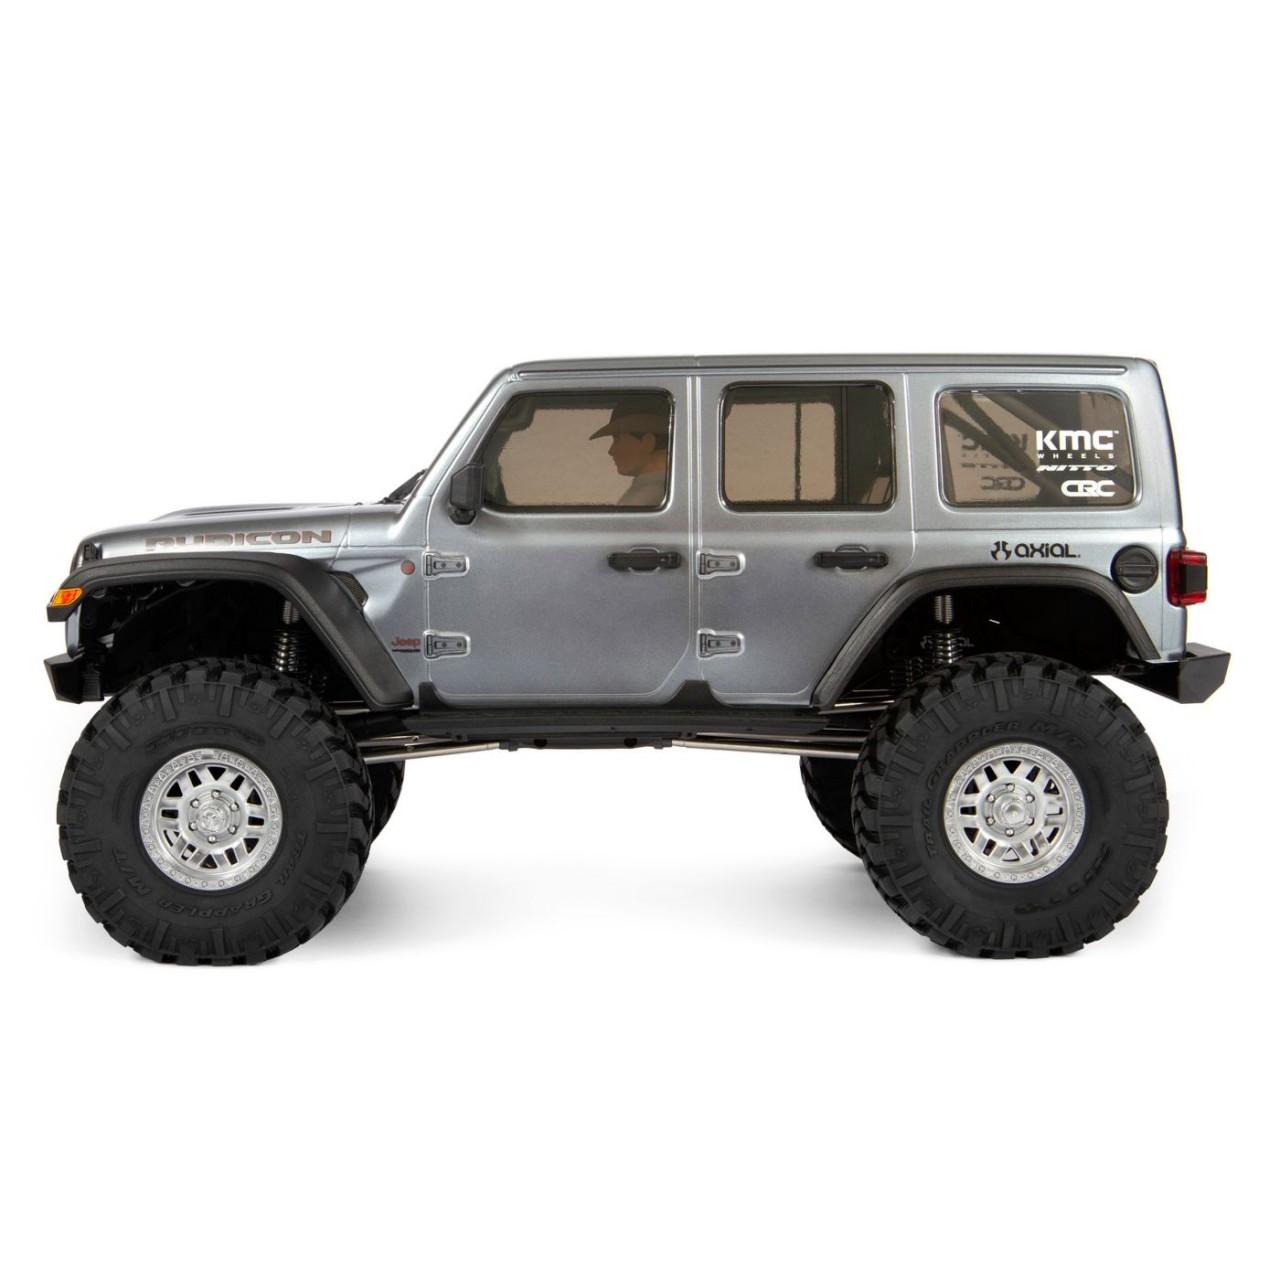 Axial 1/10 SCX10 III Jeep JLU Wrangler with Portals 4WD Kit AXI03007